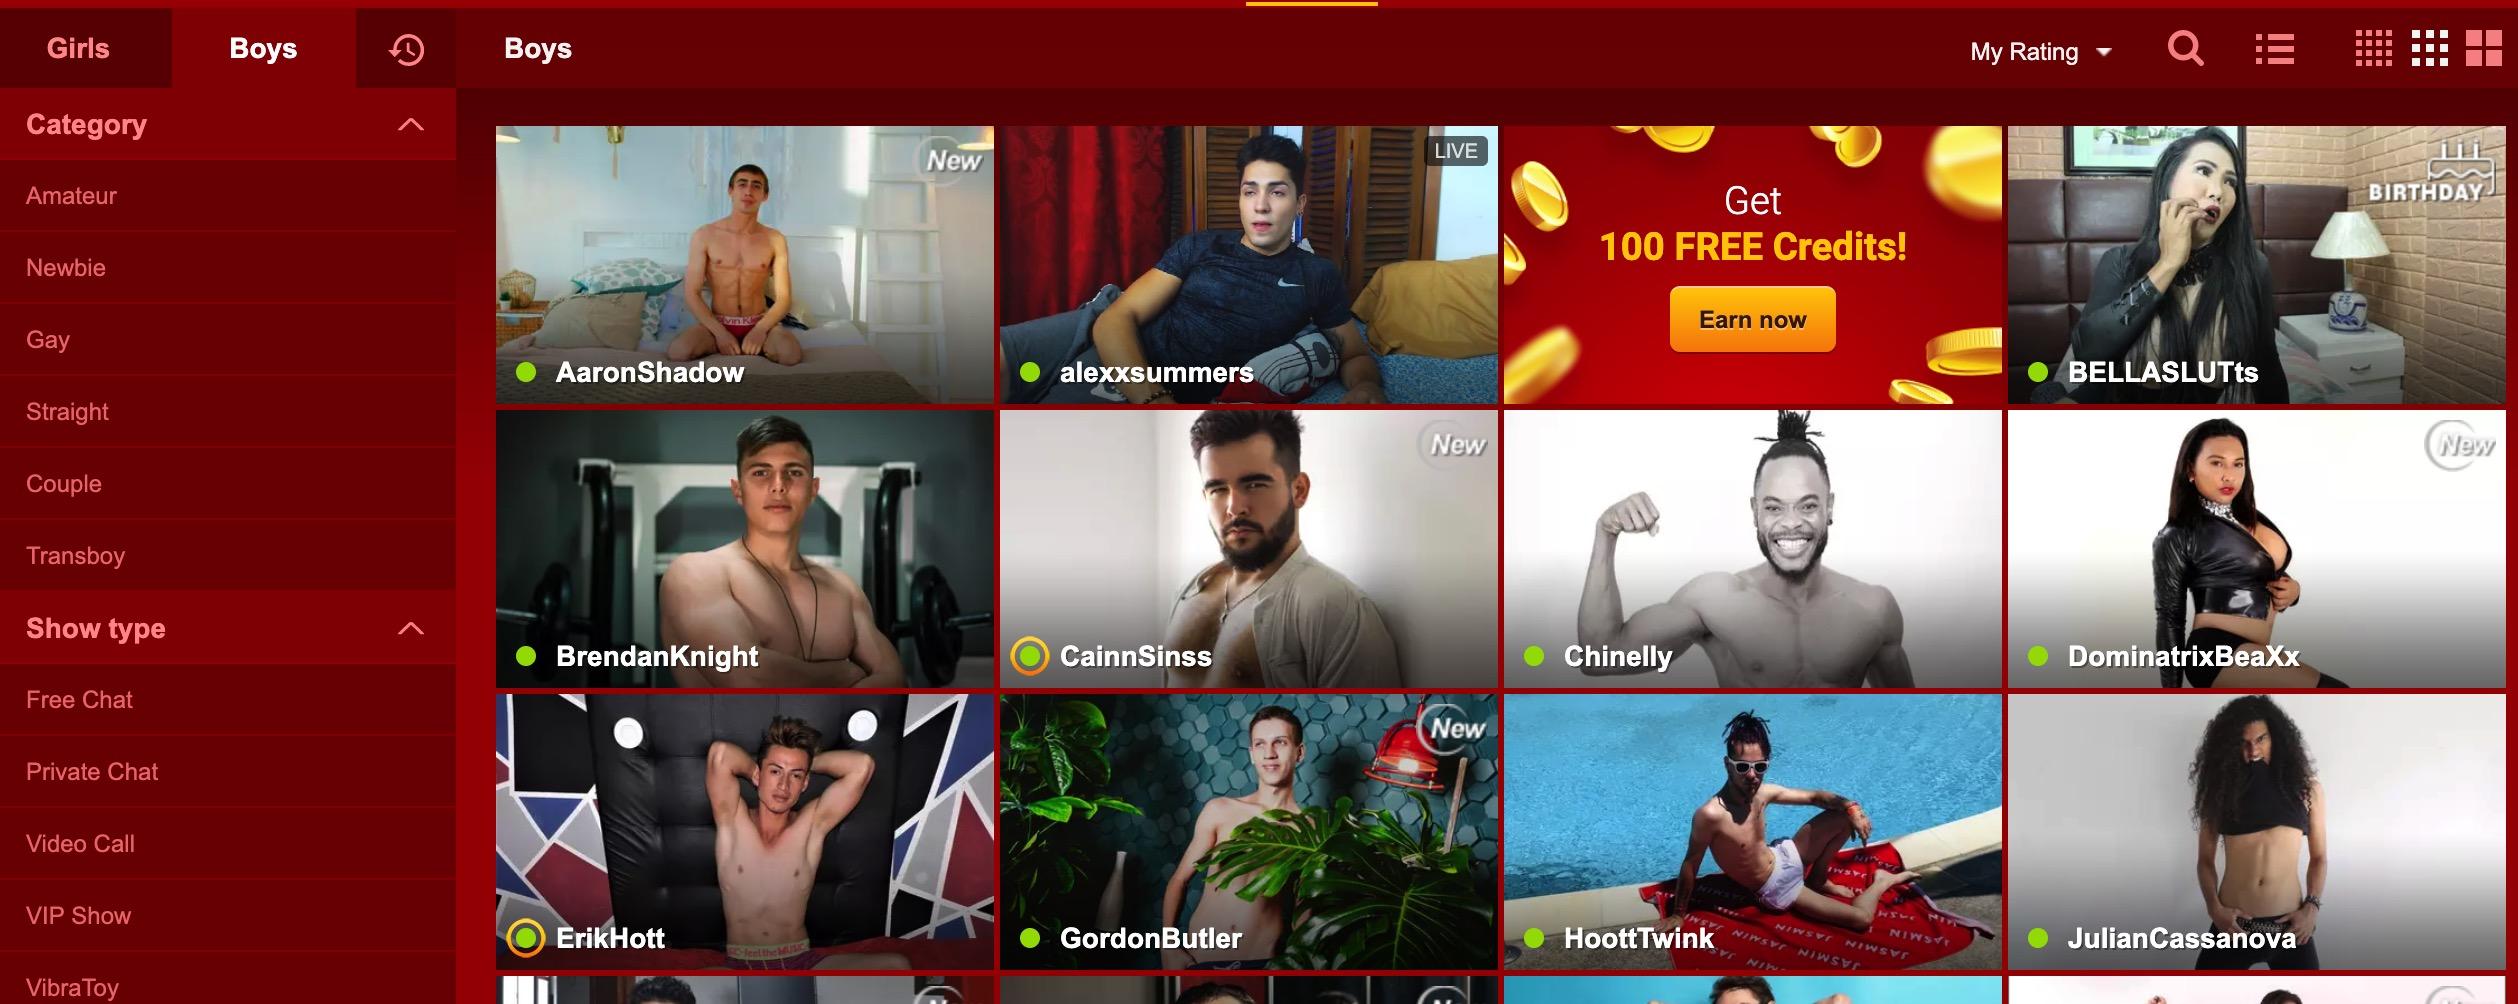 Online Cam Boys where to flirt online with a gay man   xchatz gay